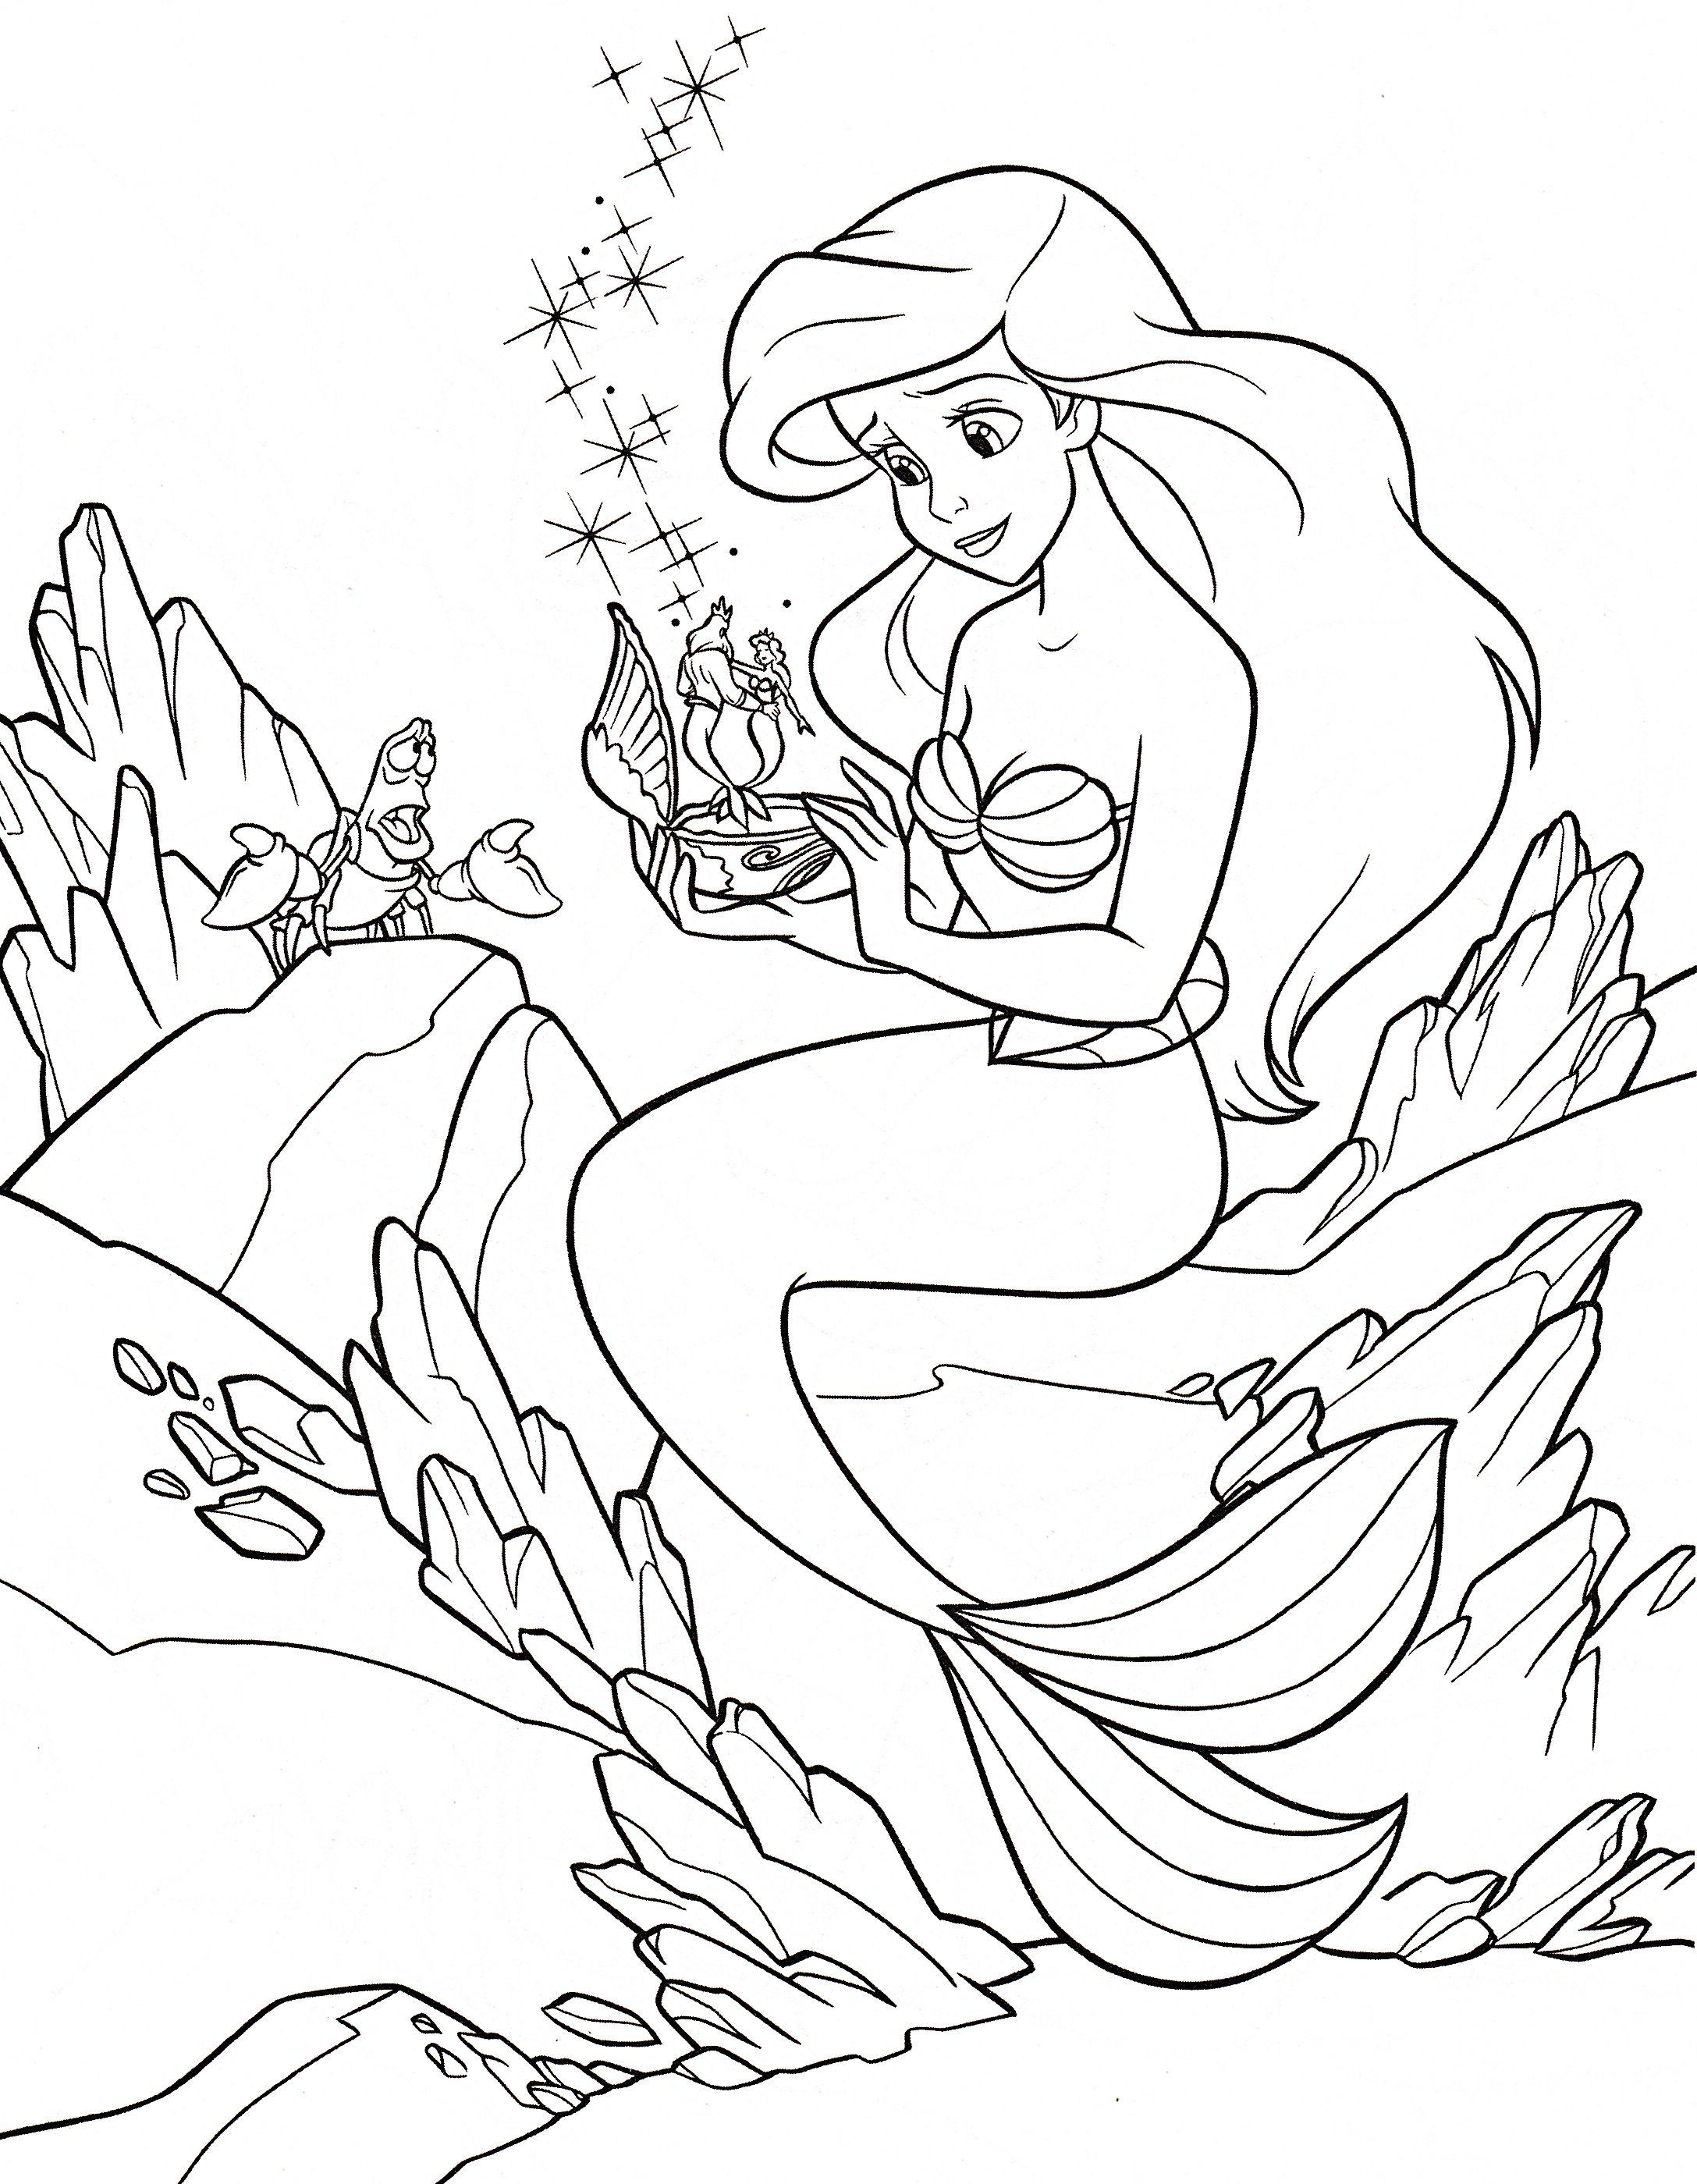 Walt Disney Characters Photo Walt Disney Coloring Pages Sebastian Princess Ariel Ariel Coloring Pages Princess Coloring Pages Mermaid Coloring Pages